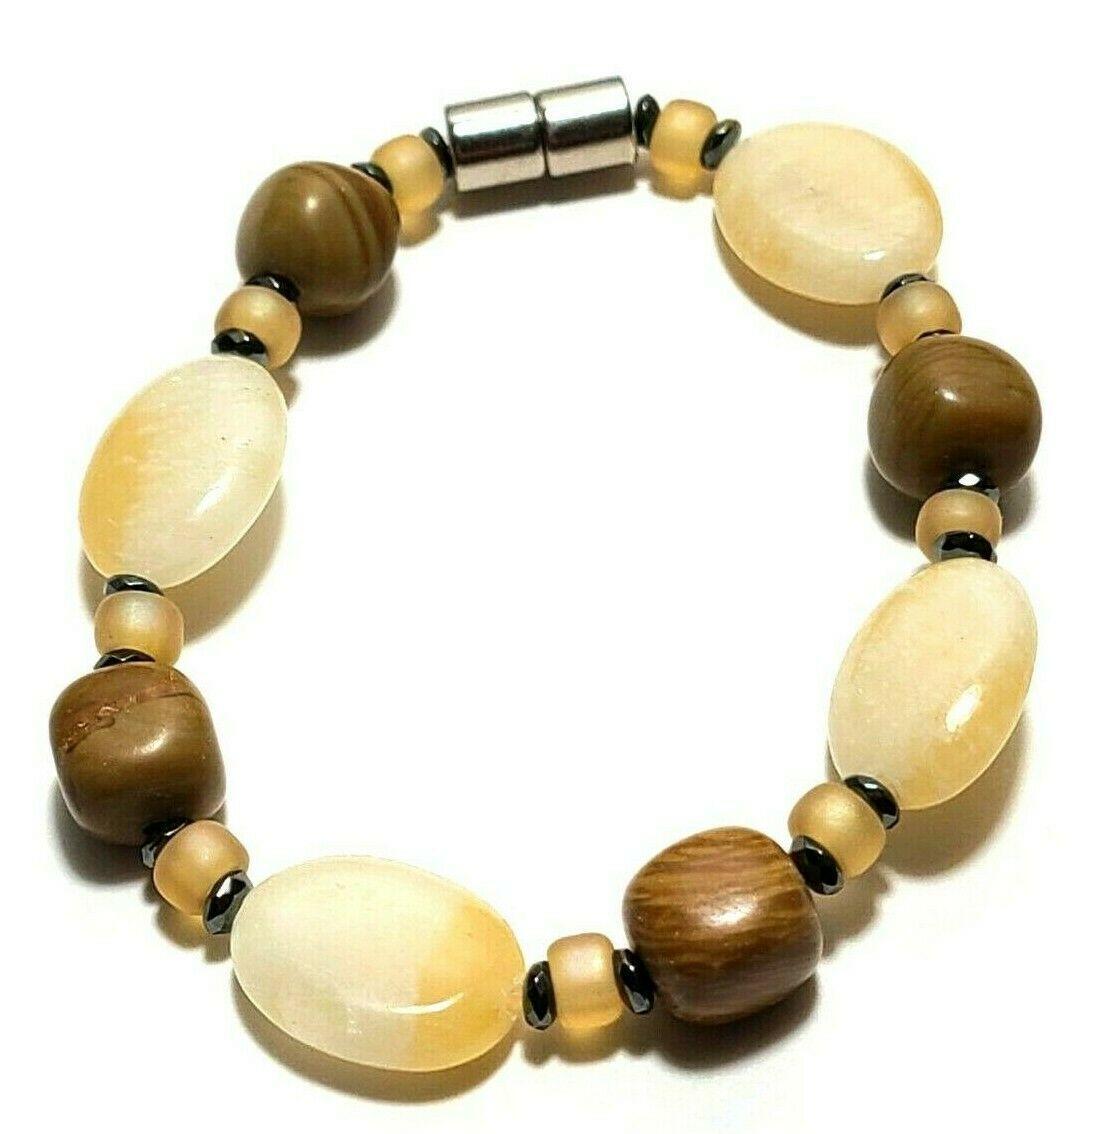 Beaded Bracelet Magnetic Hematite Clasp Single Strand   7 Inch   (MAG-021)